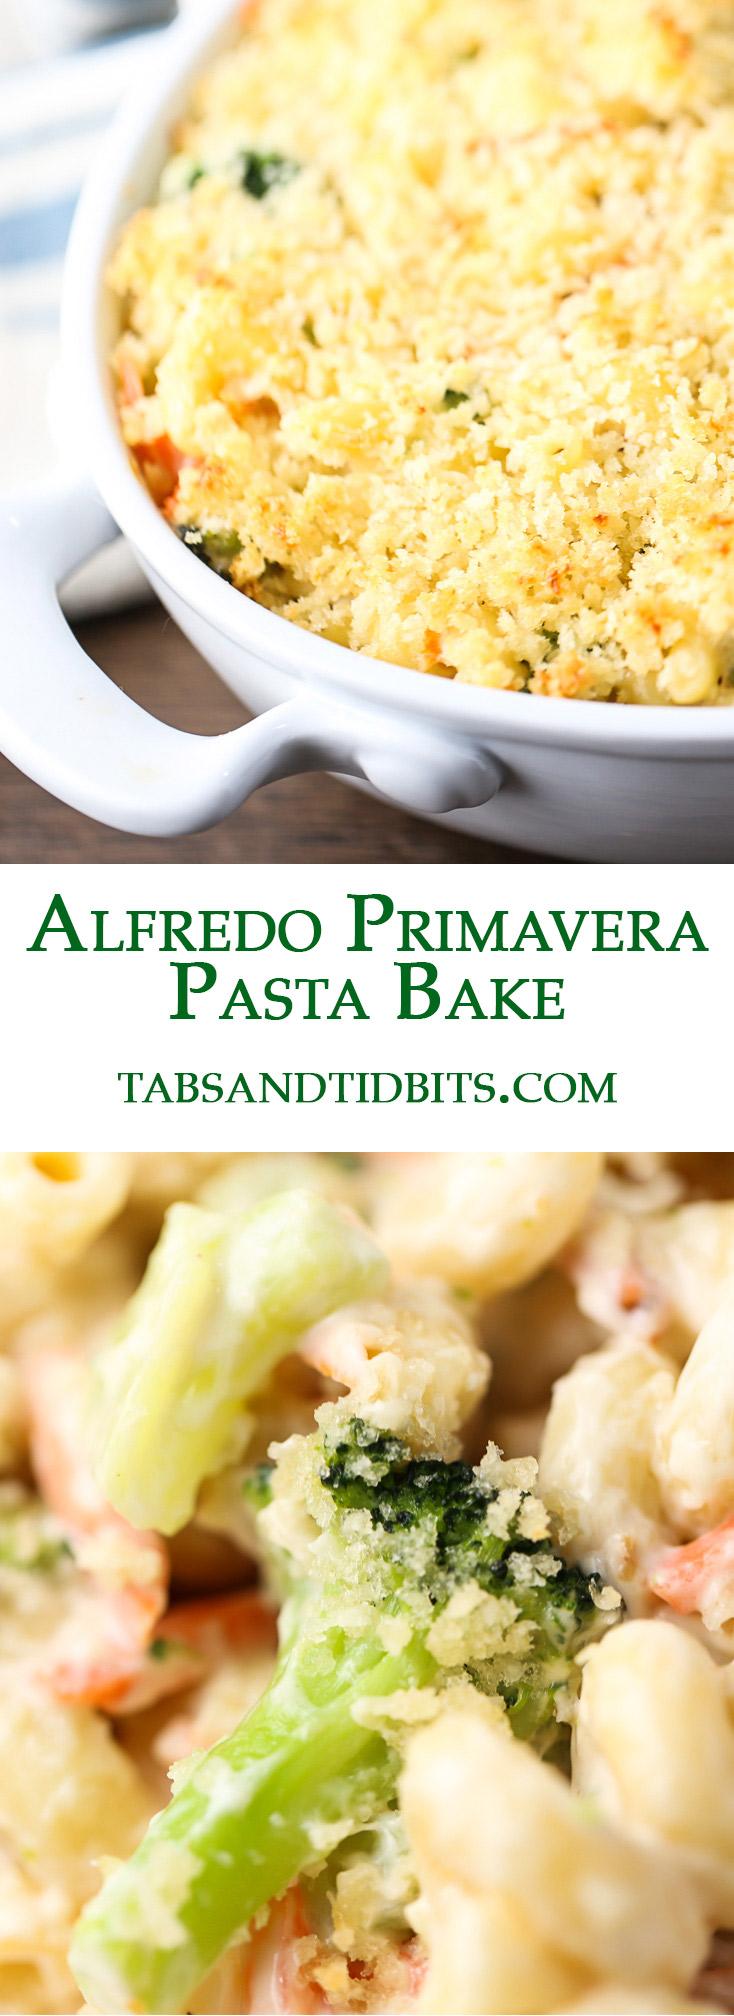 This Alfredo Primavera Pasta Bake is comfort and cozy in every singlebite!